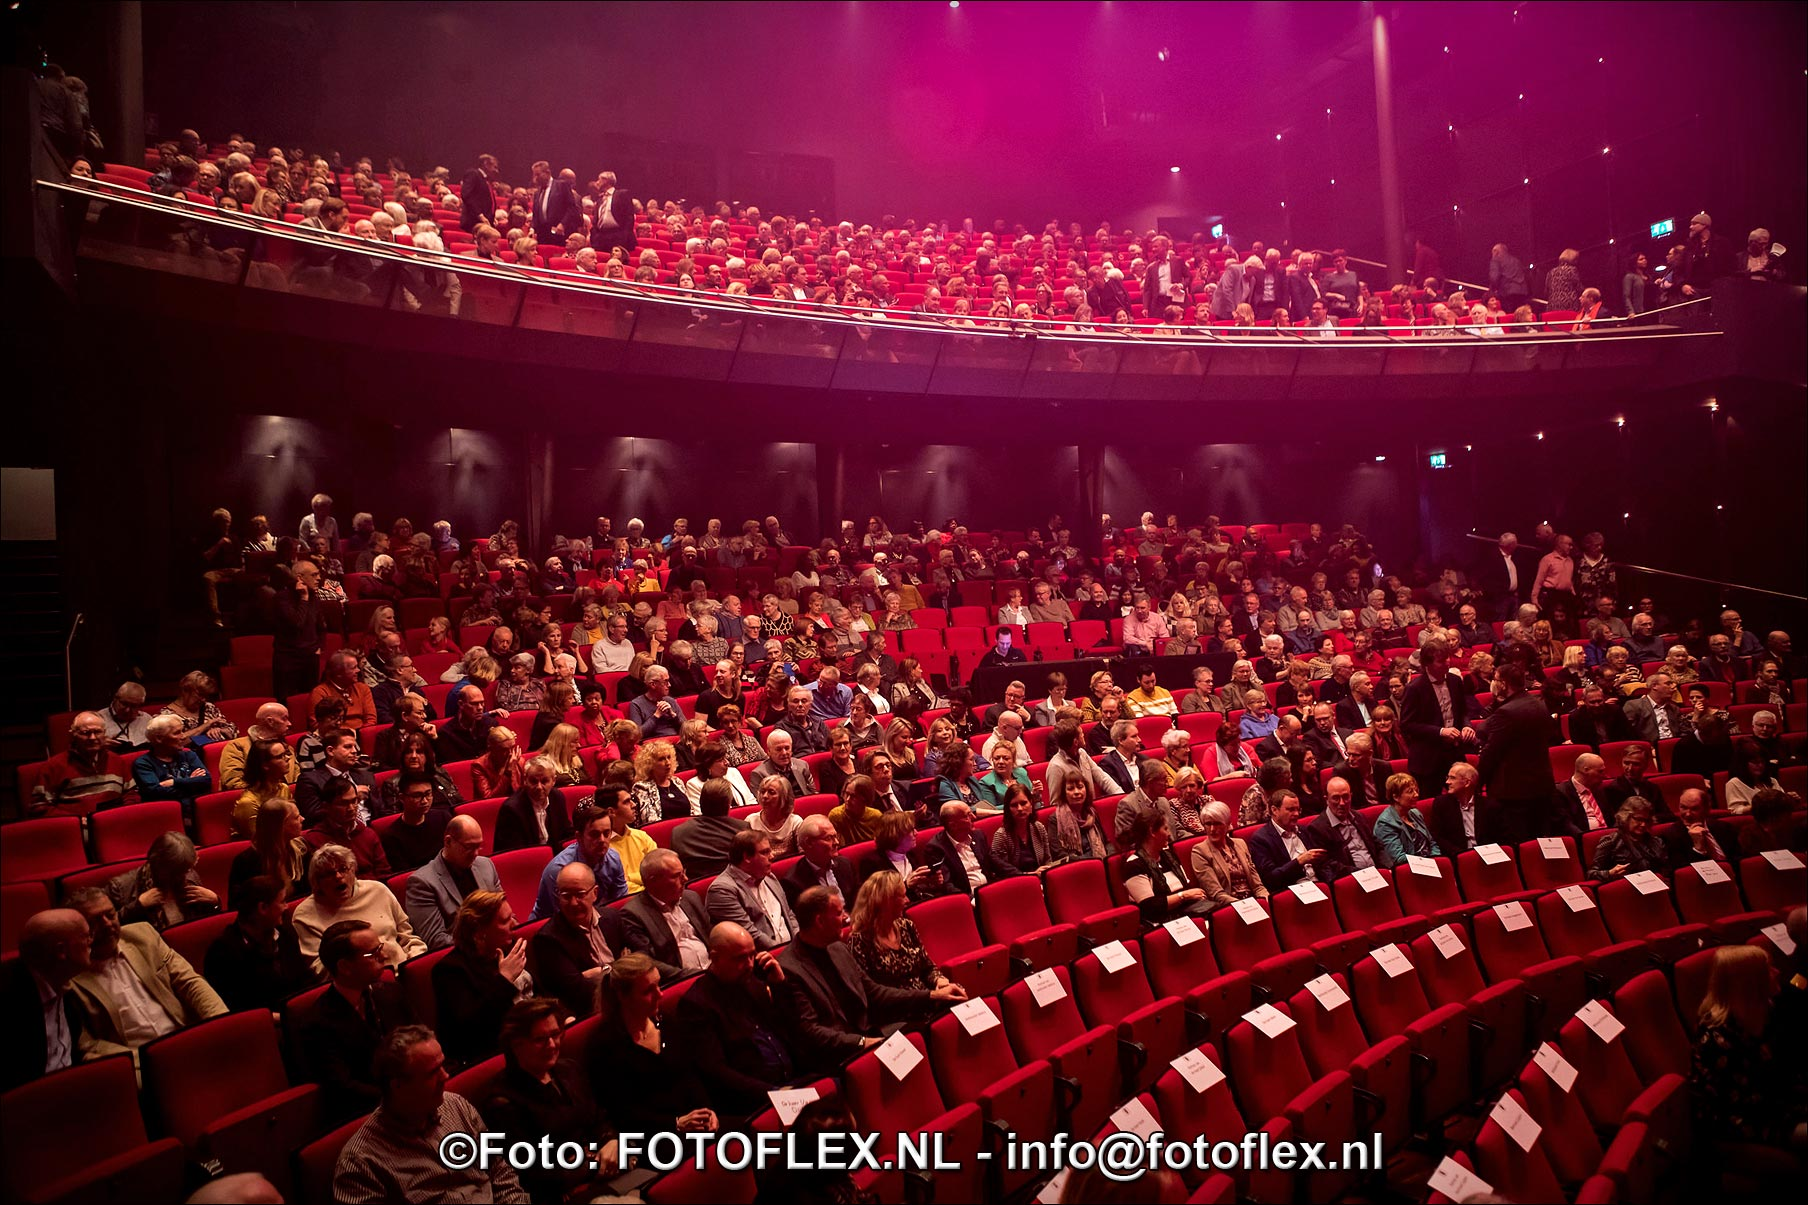 0239-CopyrightFOTOFLEX.NL07012020